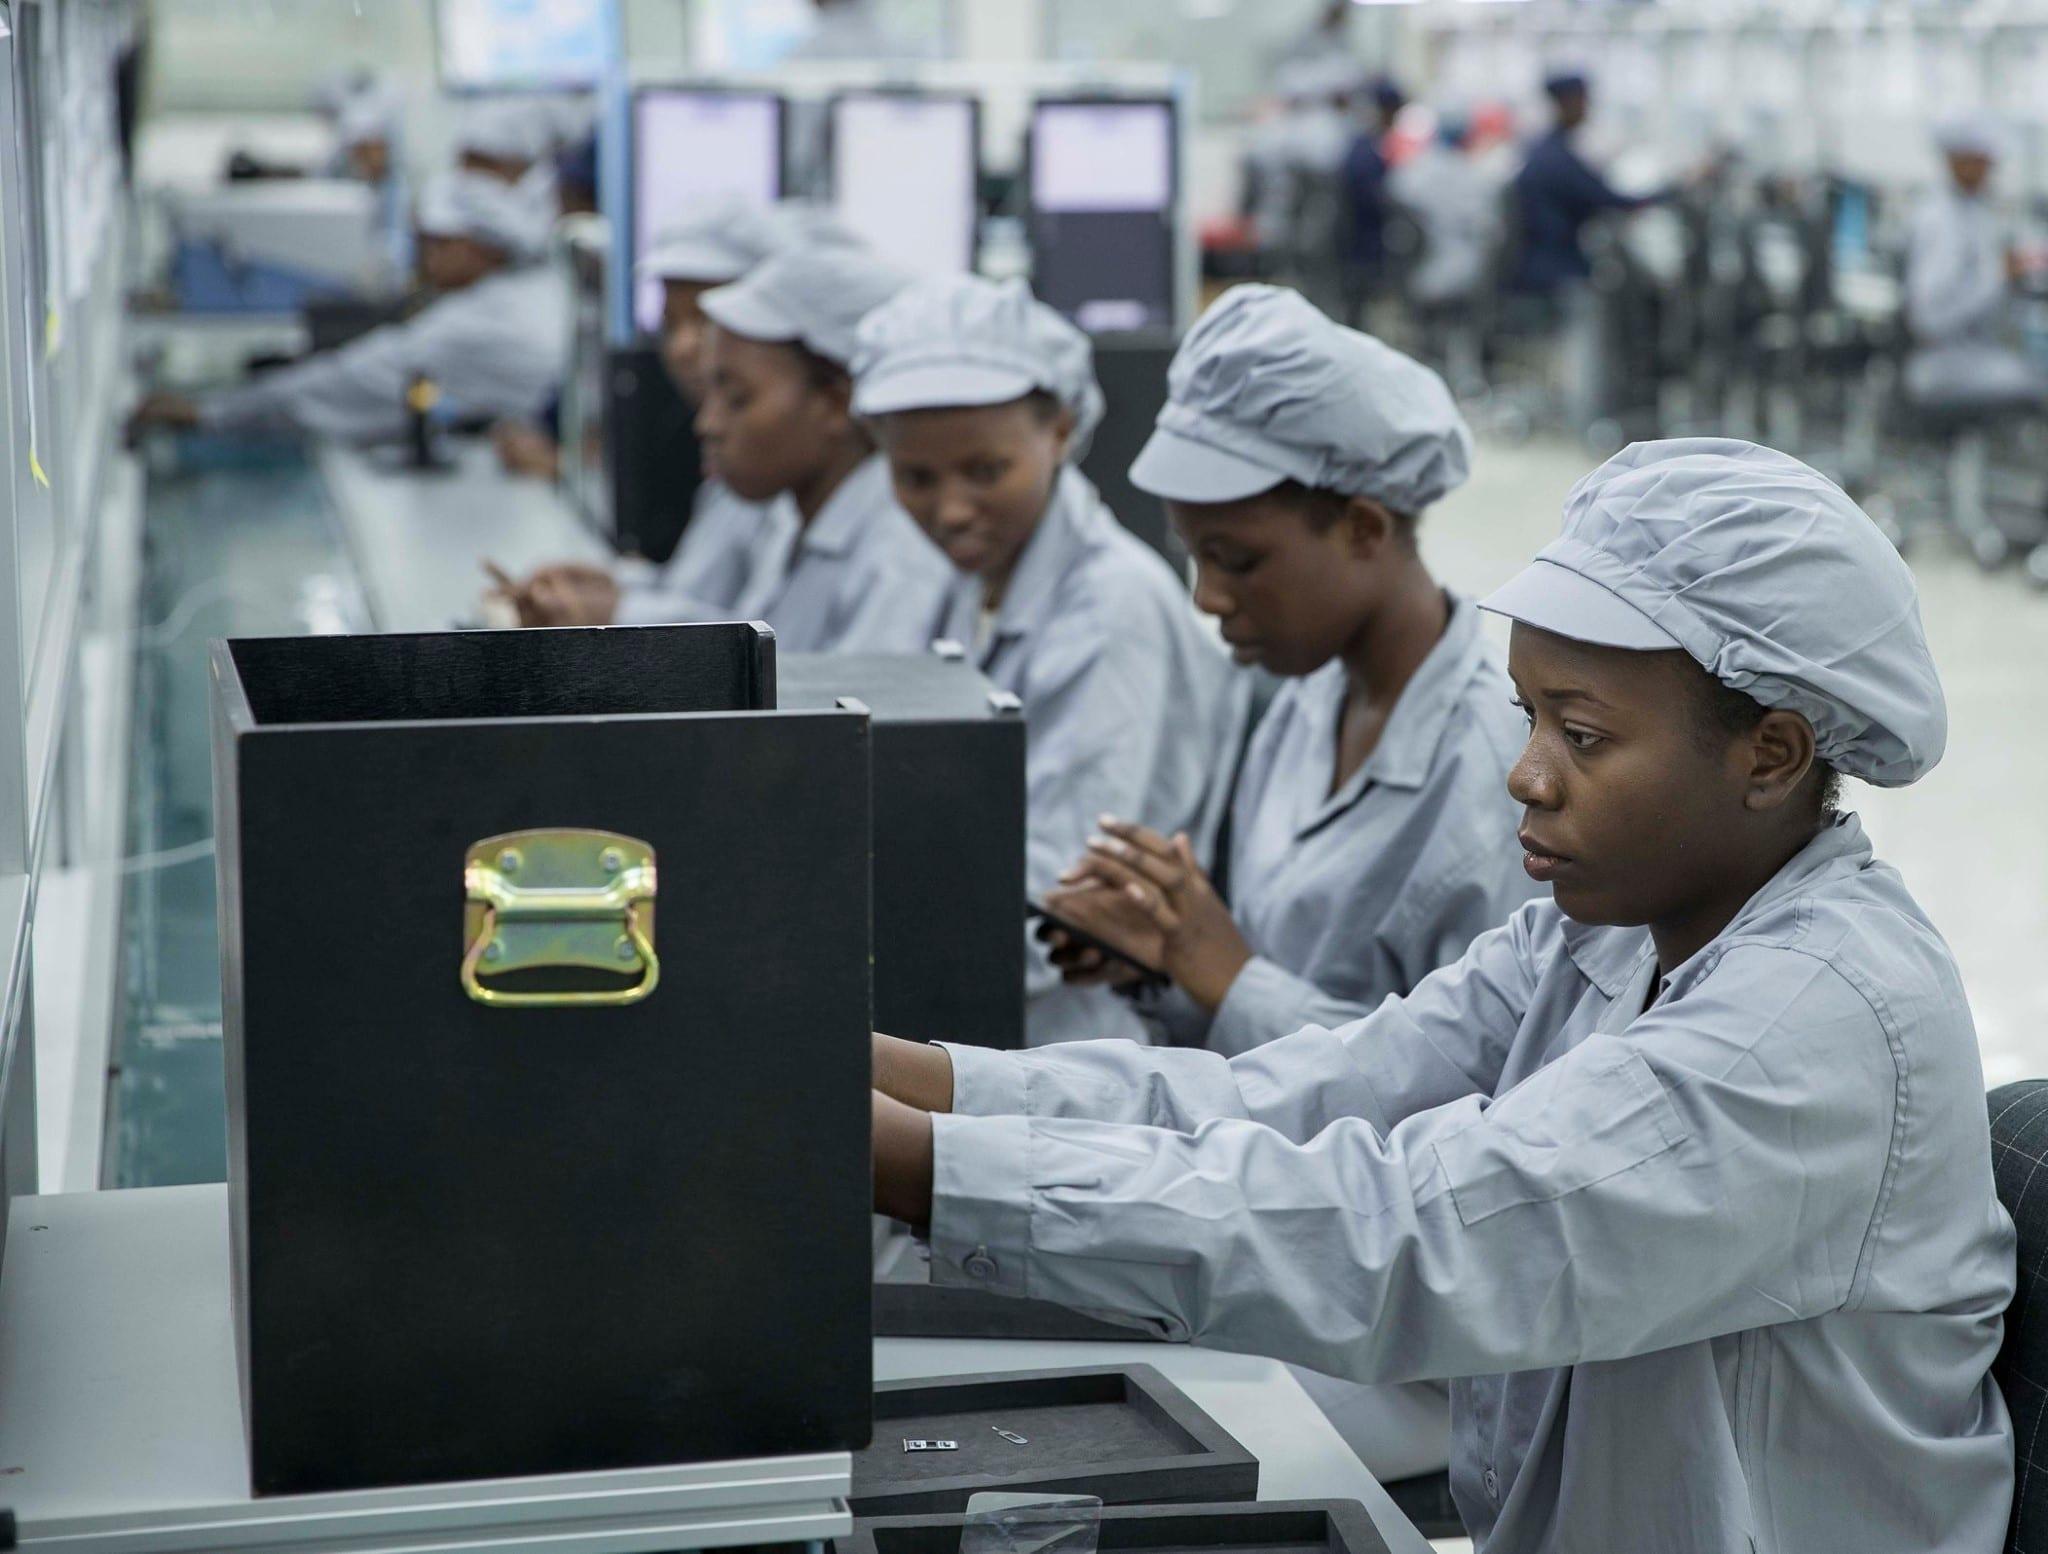 Rwanda : lancement officiel de l'usine de fabrication de smartphone